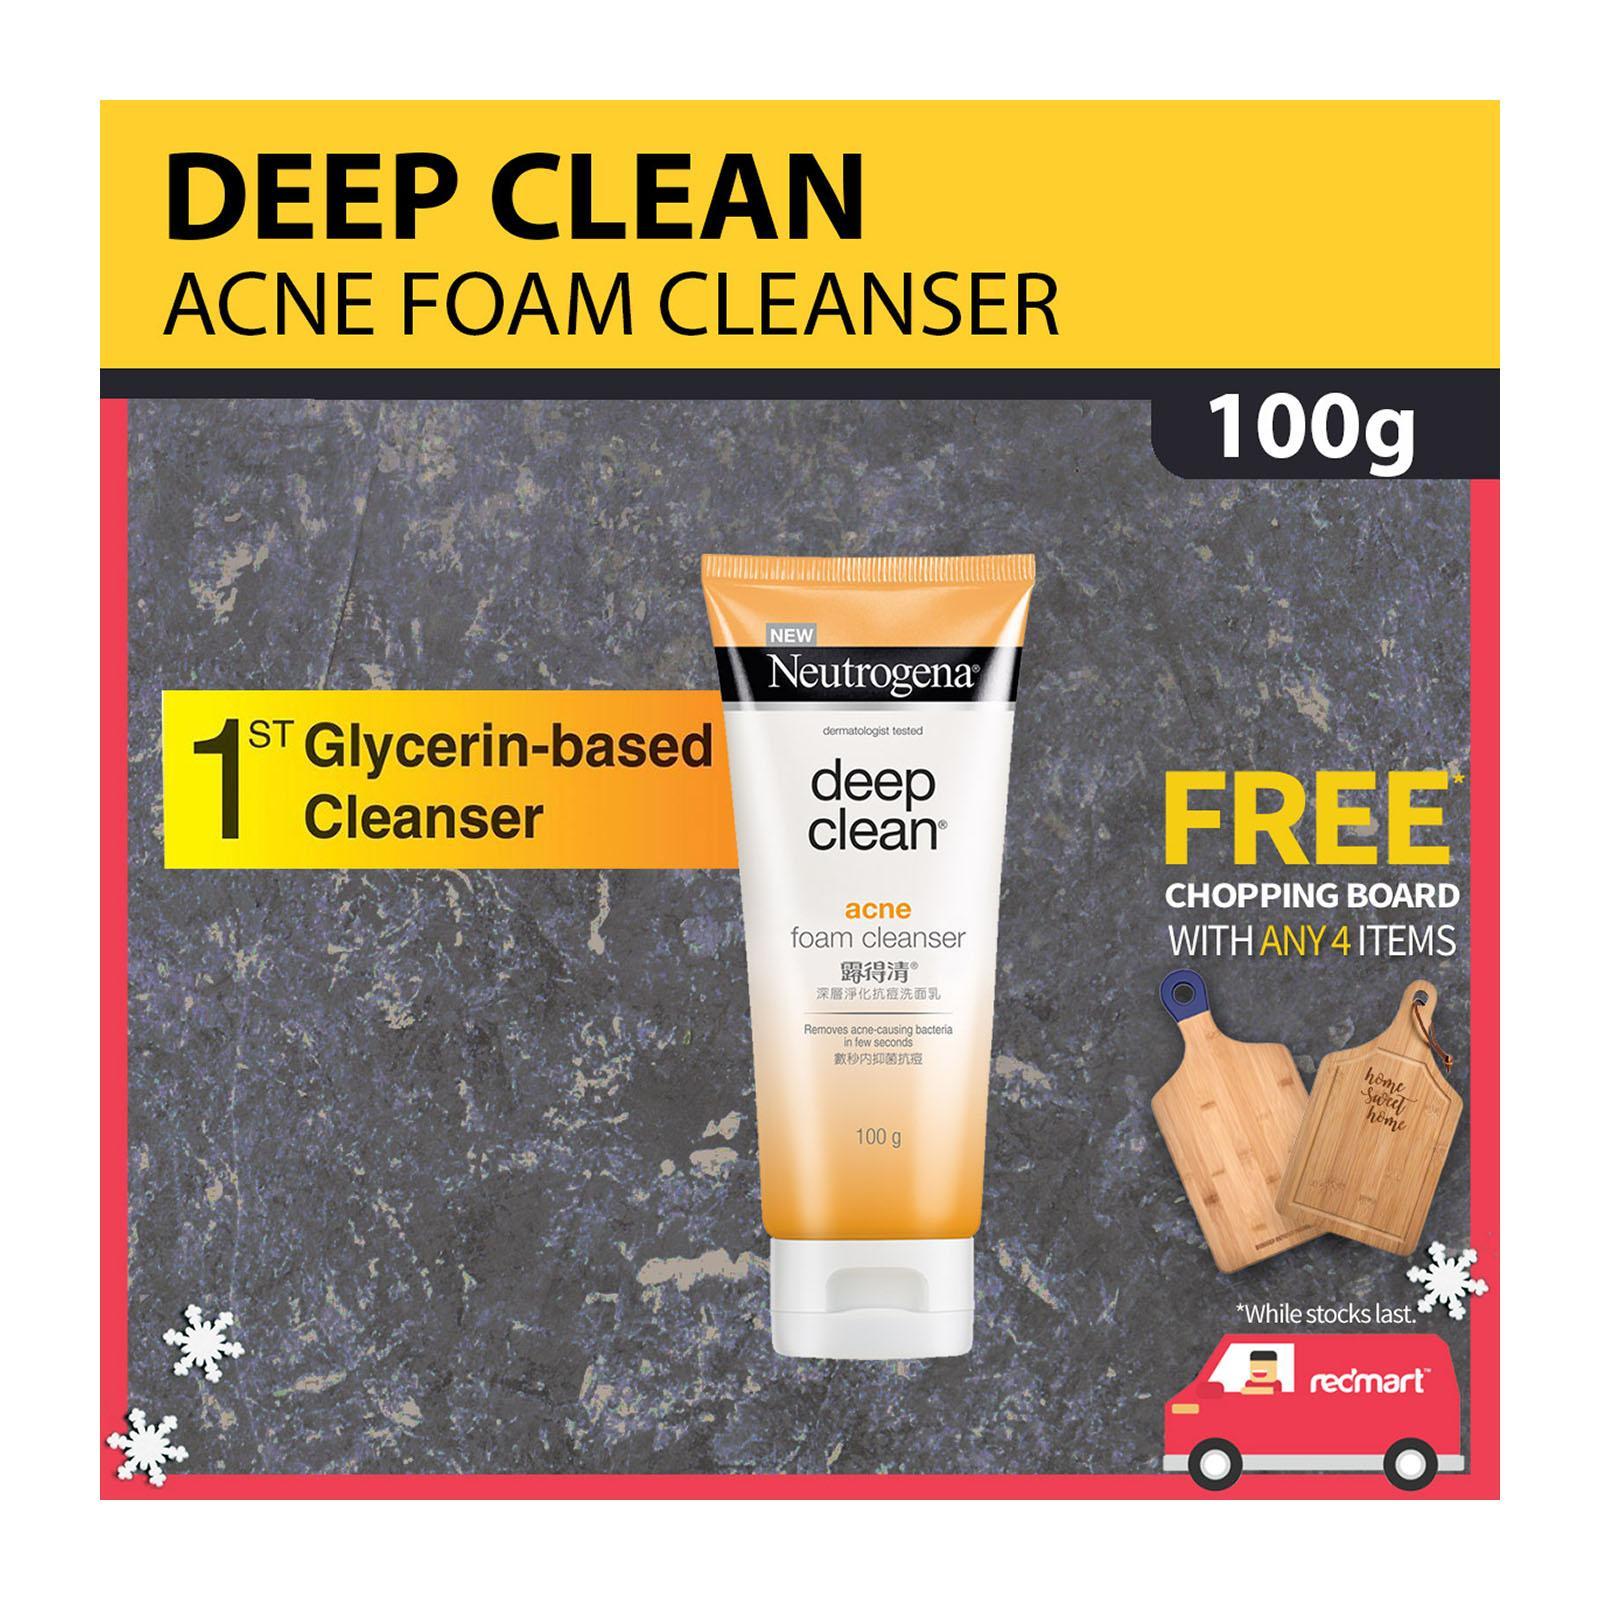 NEUTROGENA deep clean® acne foam cleanser 100g